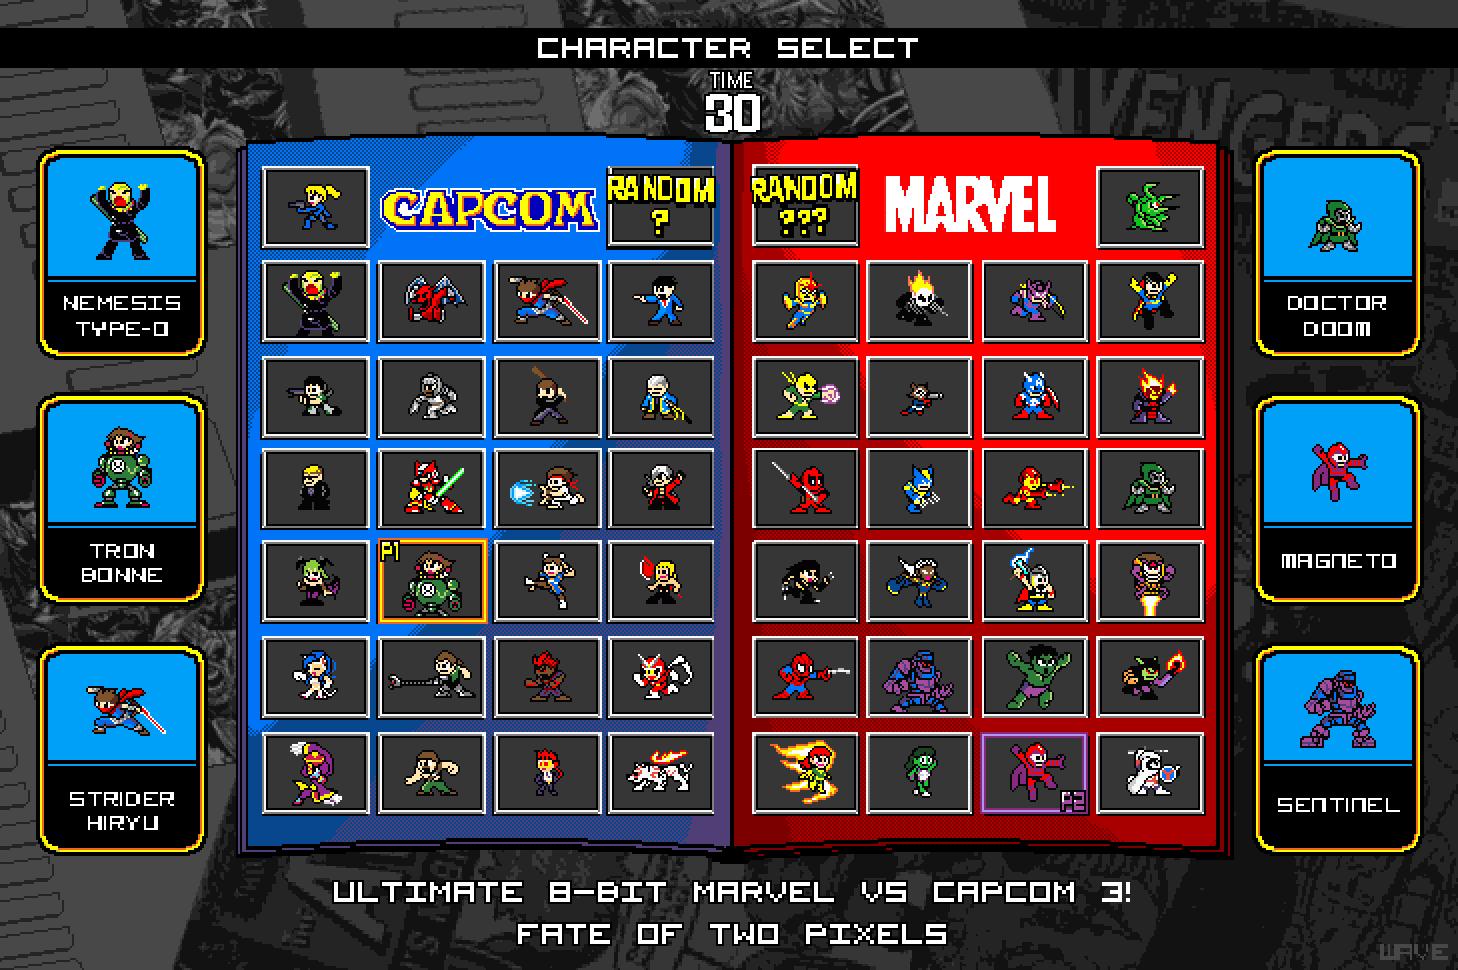 8Bit Ultimate Marvel vs Capcom by suzuran on DeviantArt